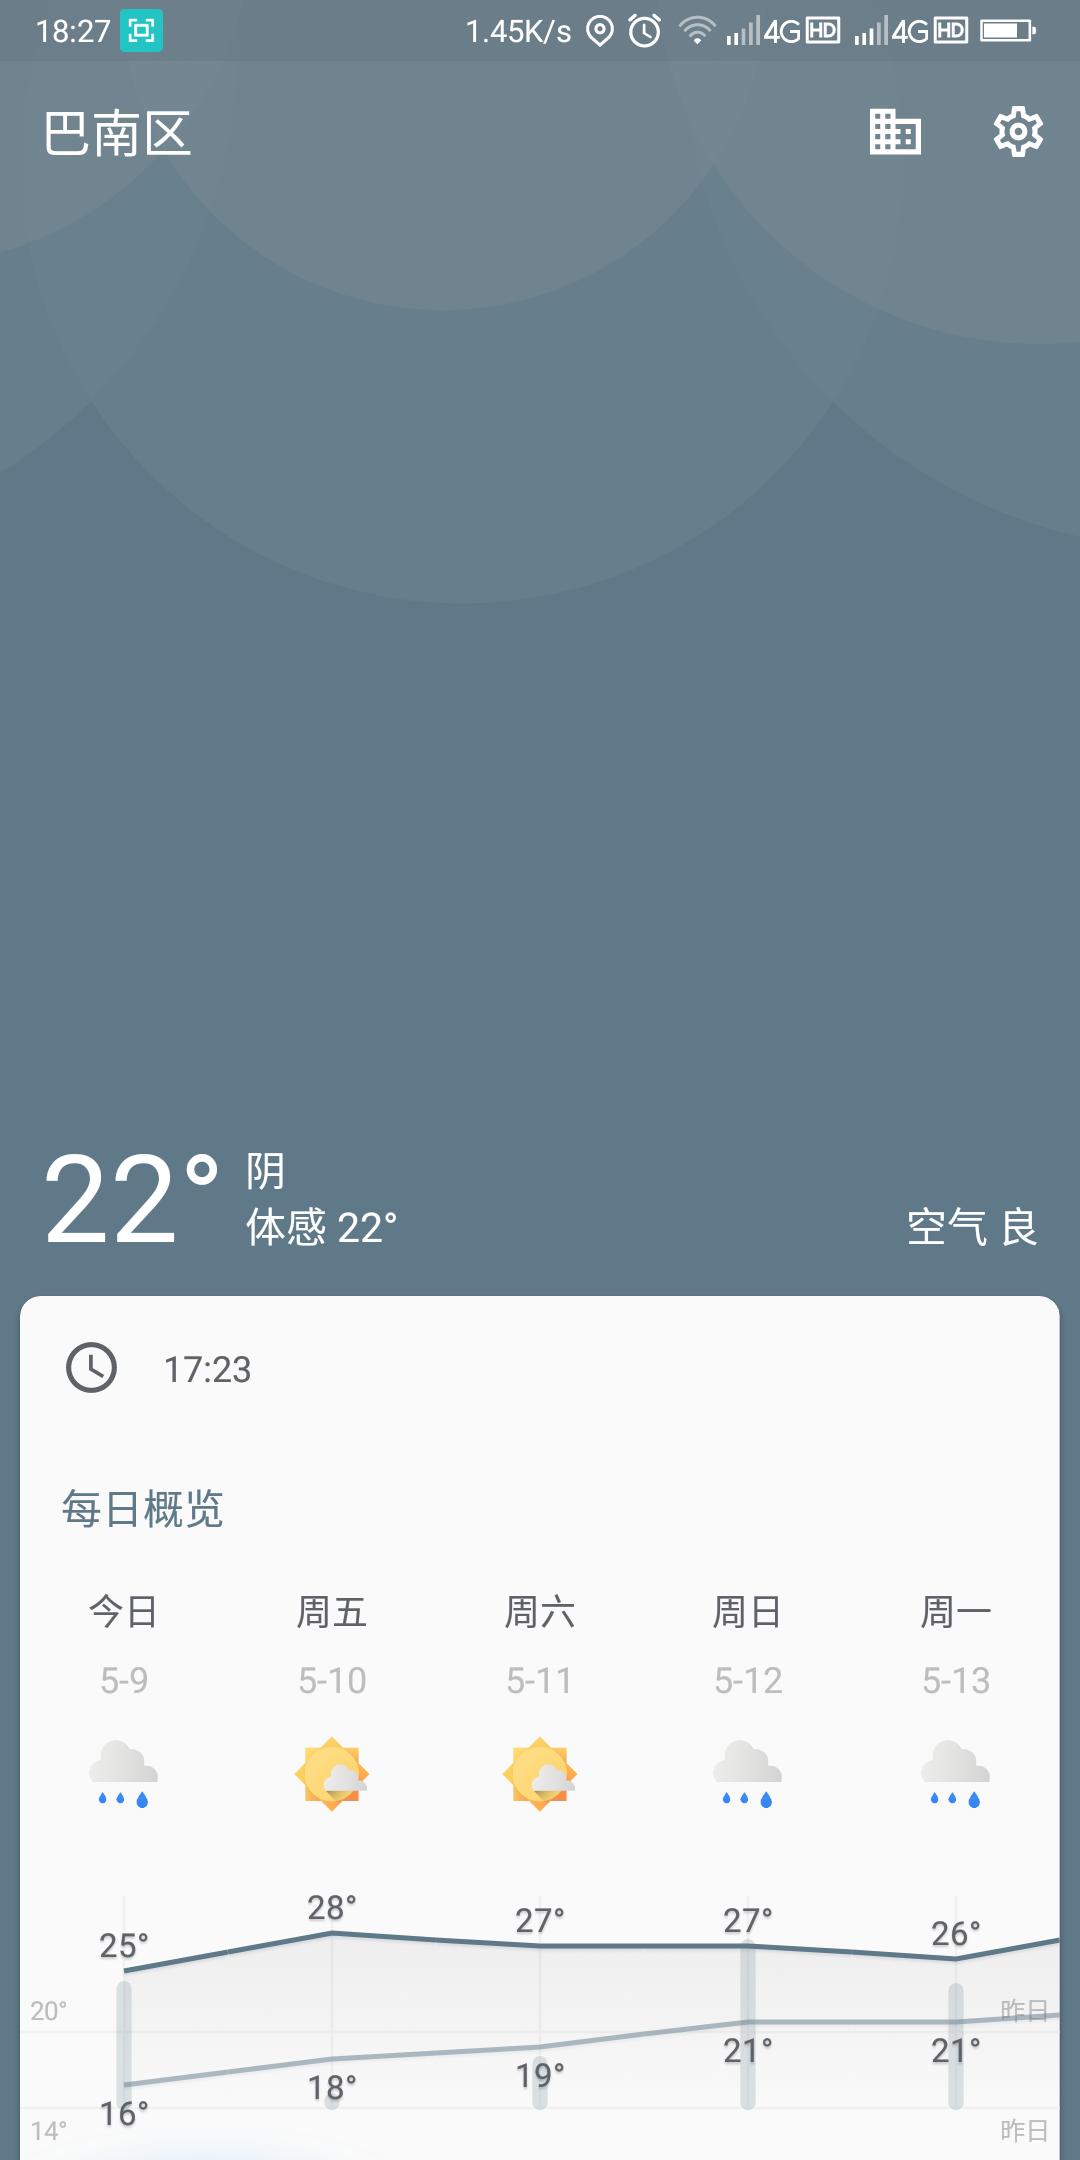 Screenshot_2019-05-09-18-28-01.png